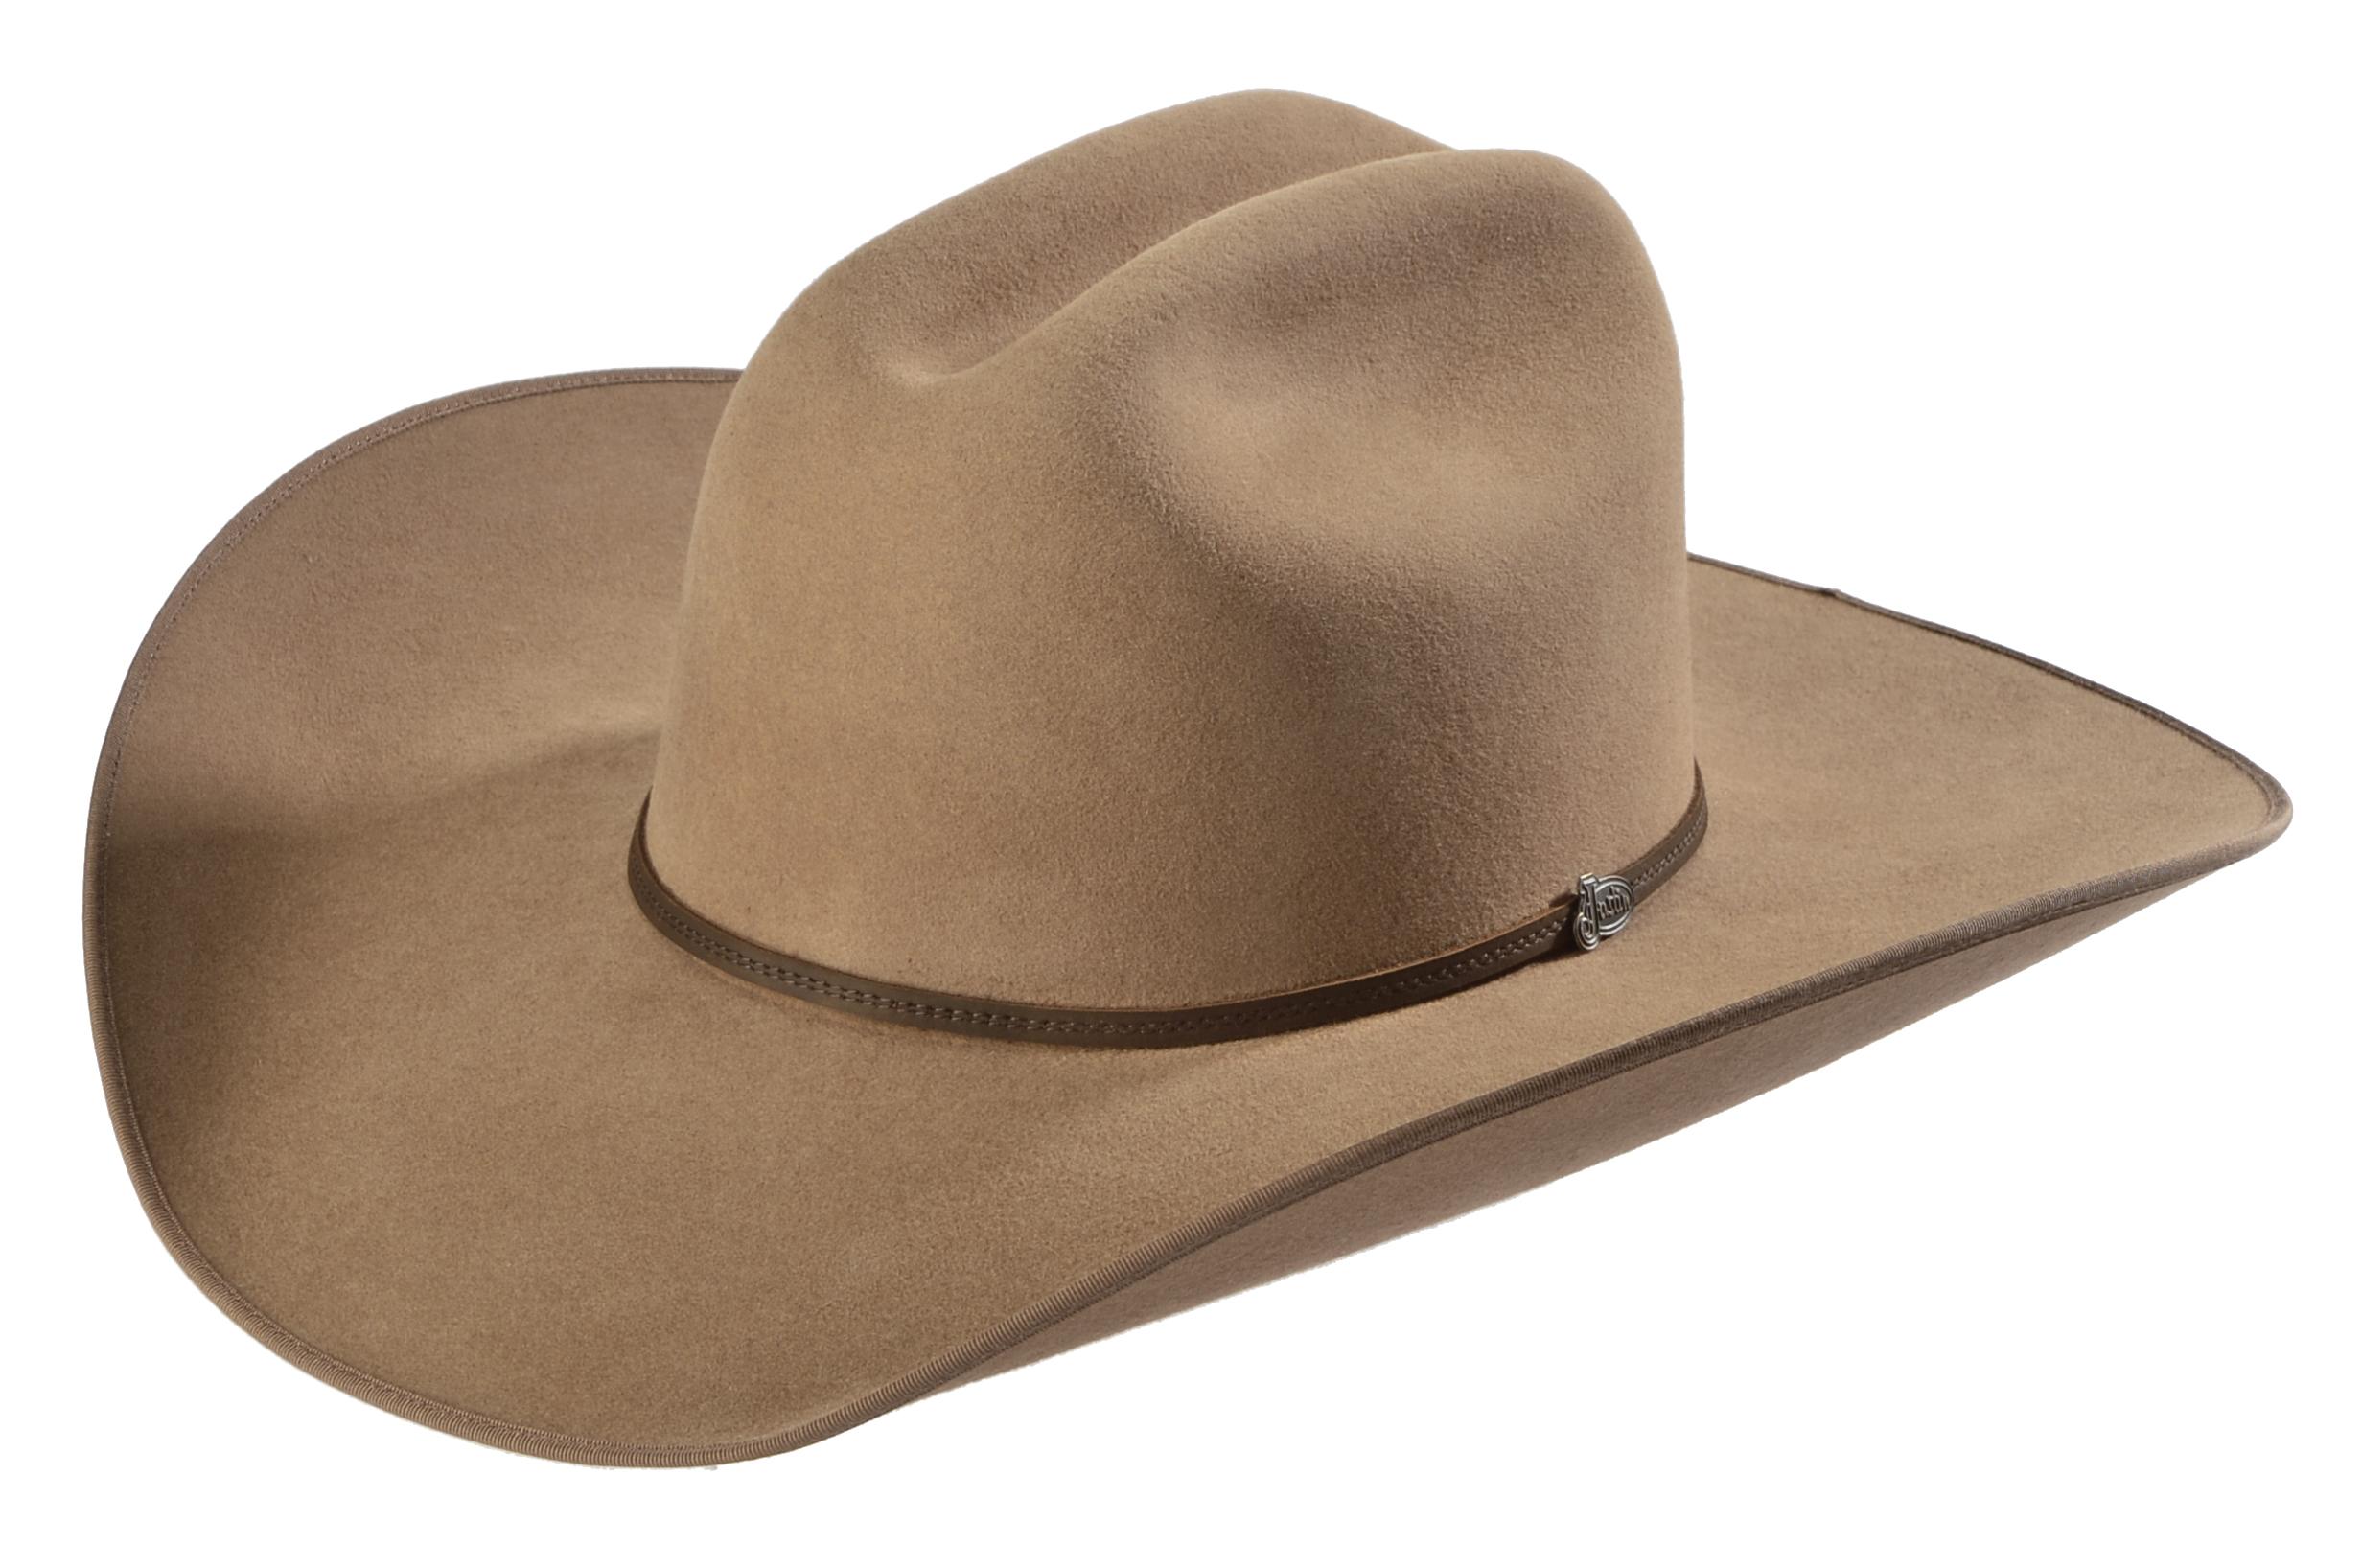 Justin Bent Rail 7x Hooch Pecan Fur Felt Cowboy Hat Sheplers